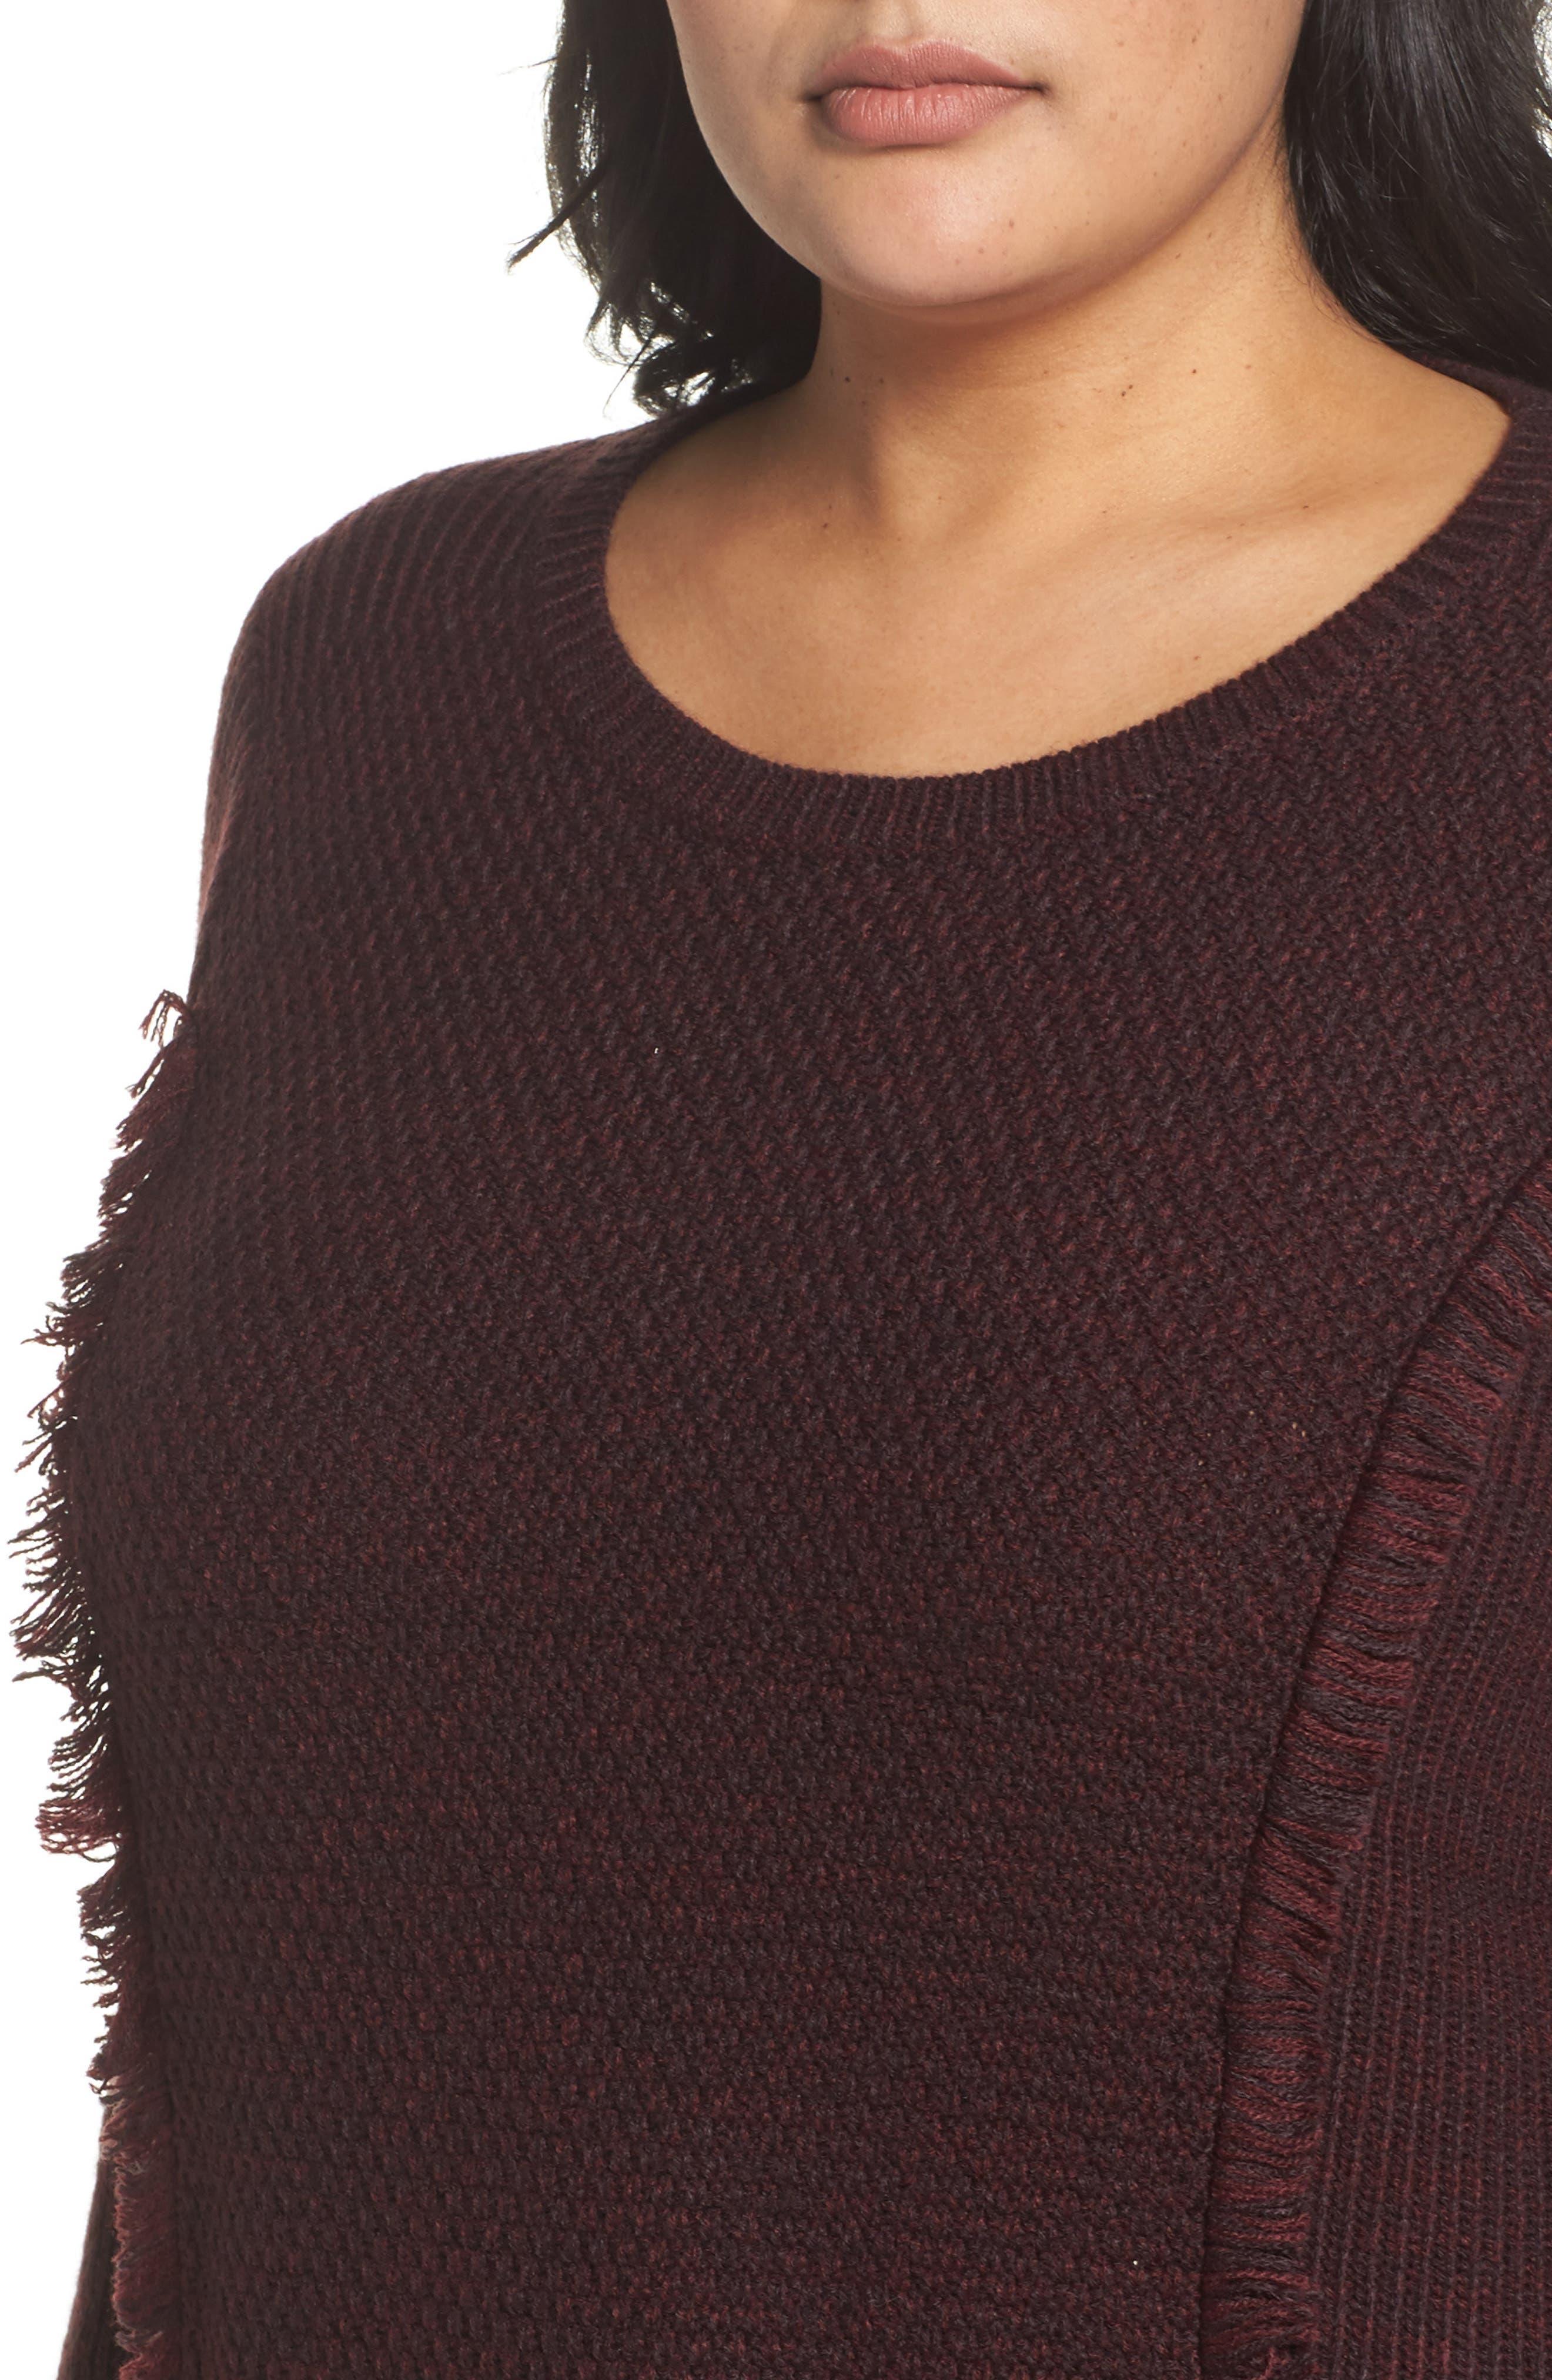 Sophia Layered Look Sweater,                             Alternate thumbnail 4, color,                             606